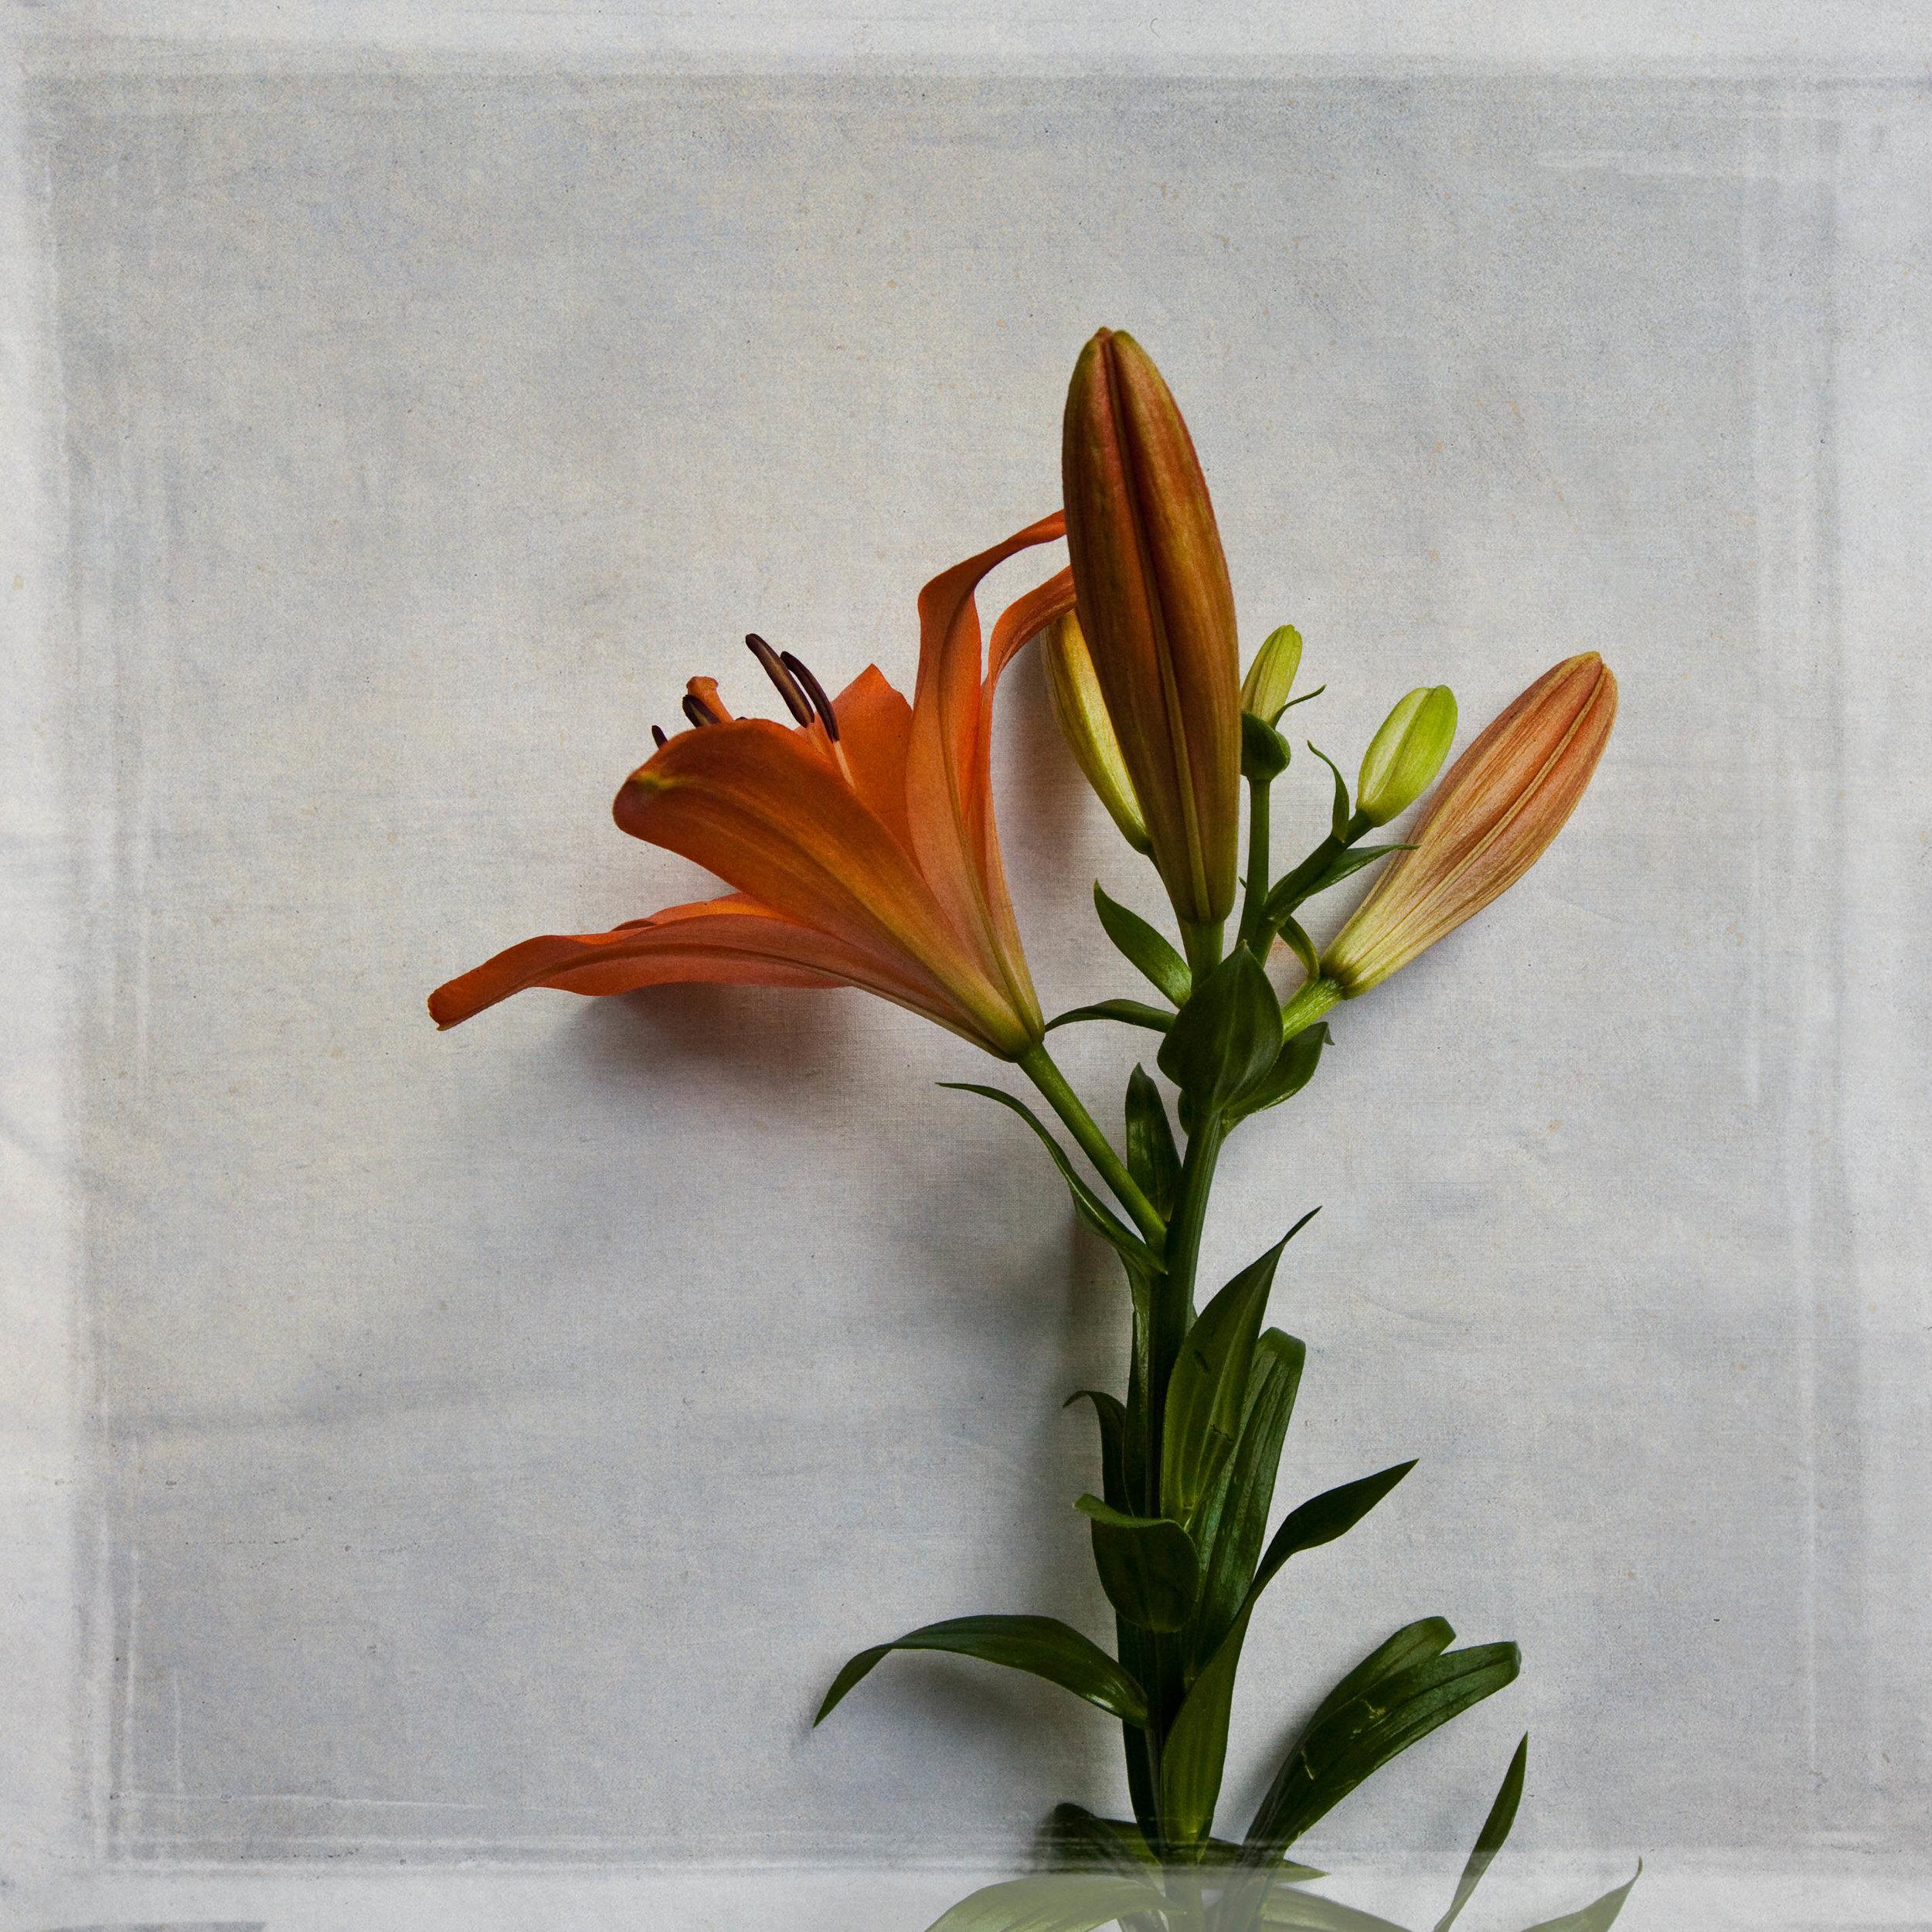 lily-7775.jpg